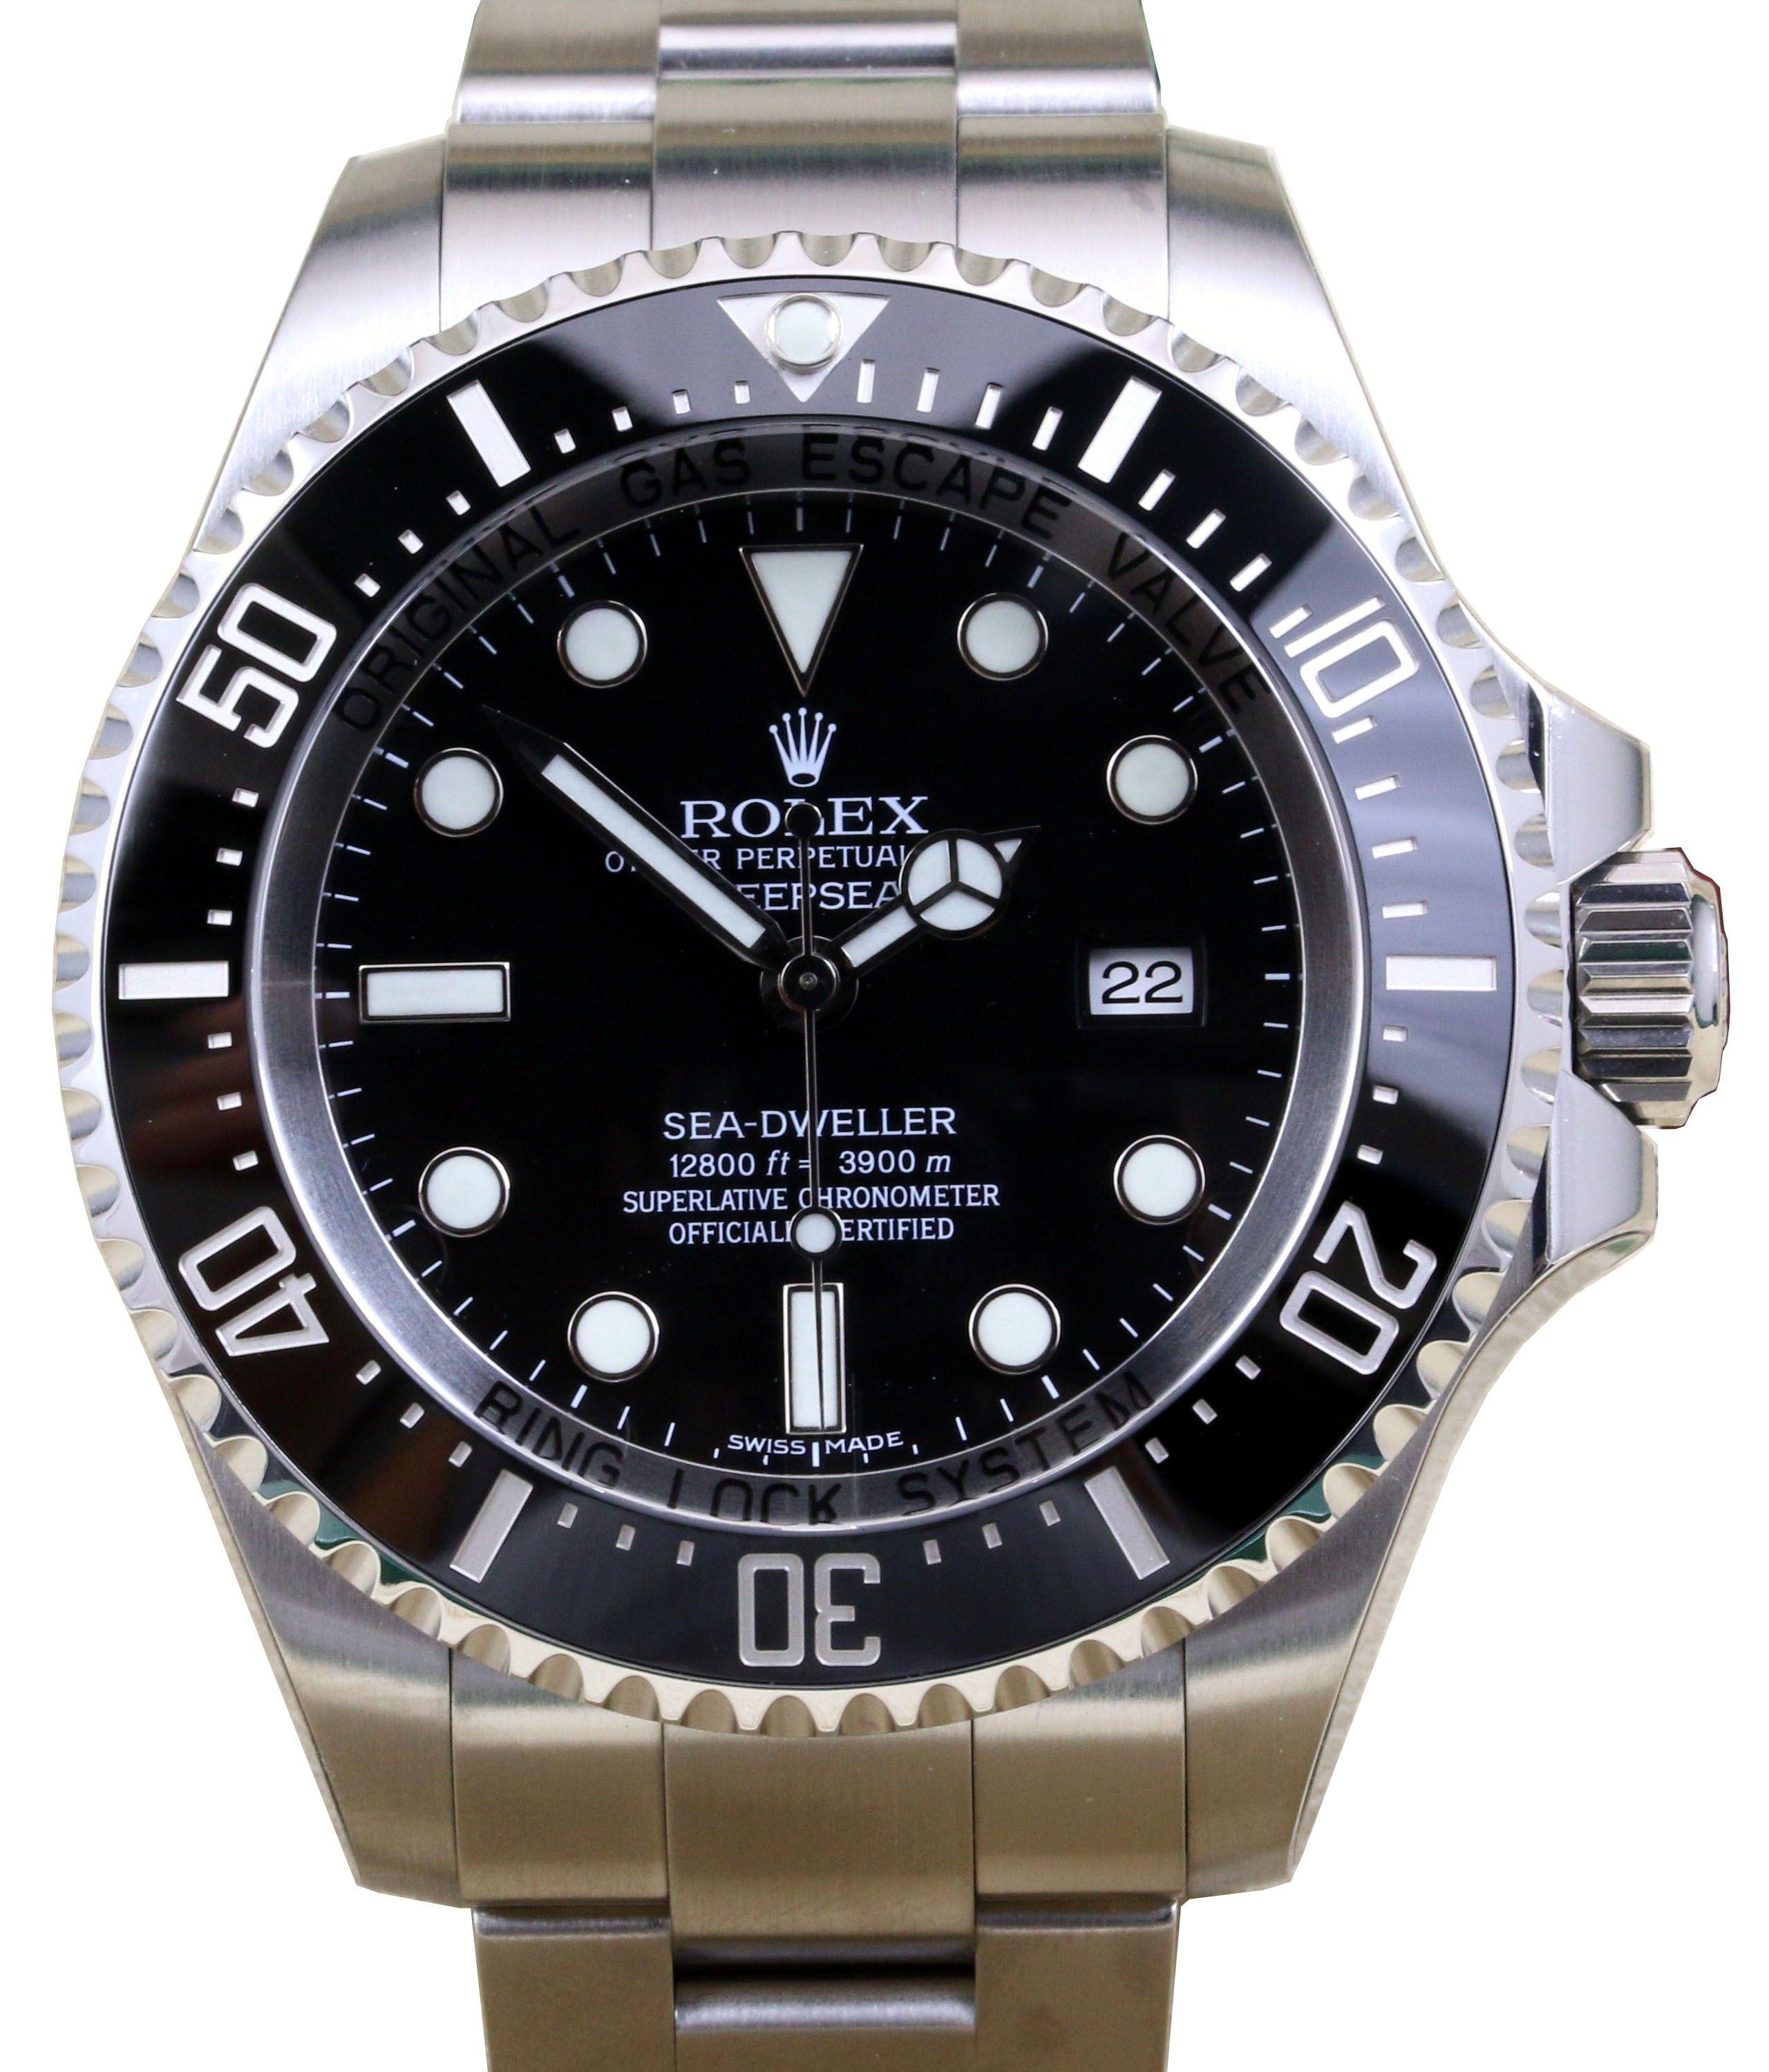 Rolex Deepsea 116660 Ceramic Stainless Steel 44mm Black